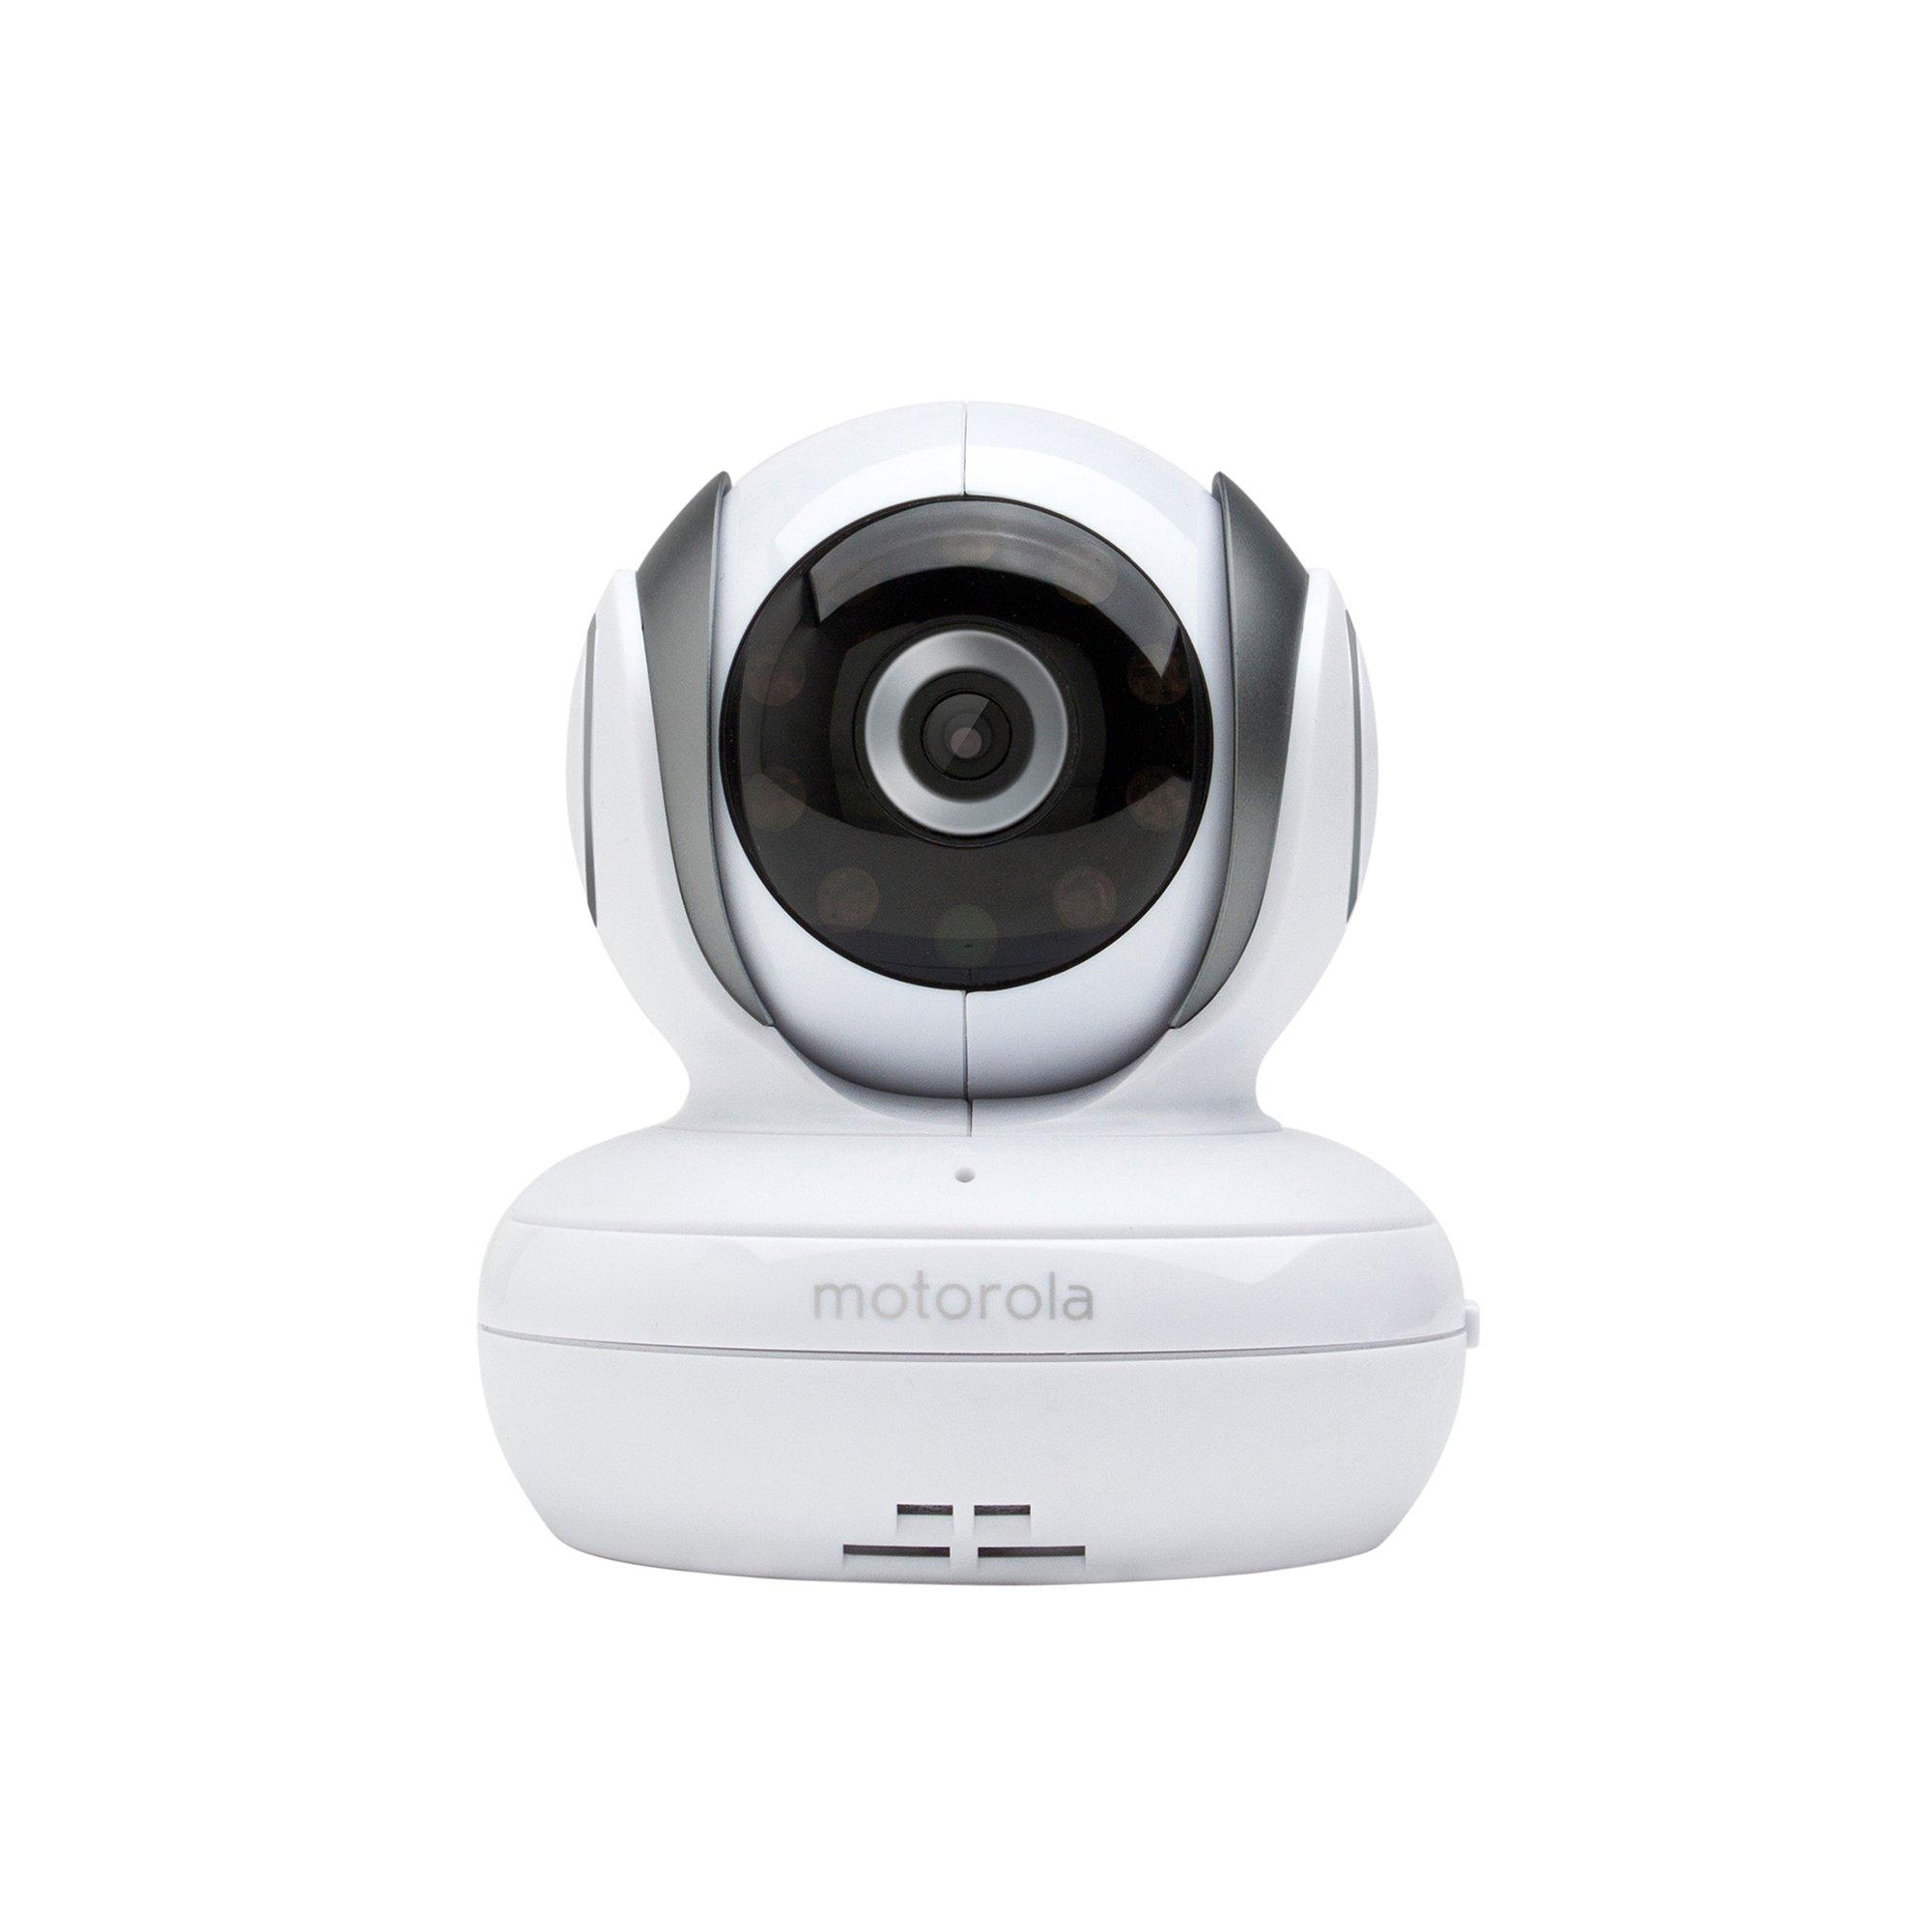 Motorola Additional Camera for Motorola MBP33S and MBP36S Baby Monitors (MBP36SBU) by Motorola (Image #1)